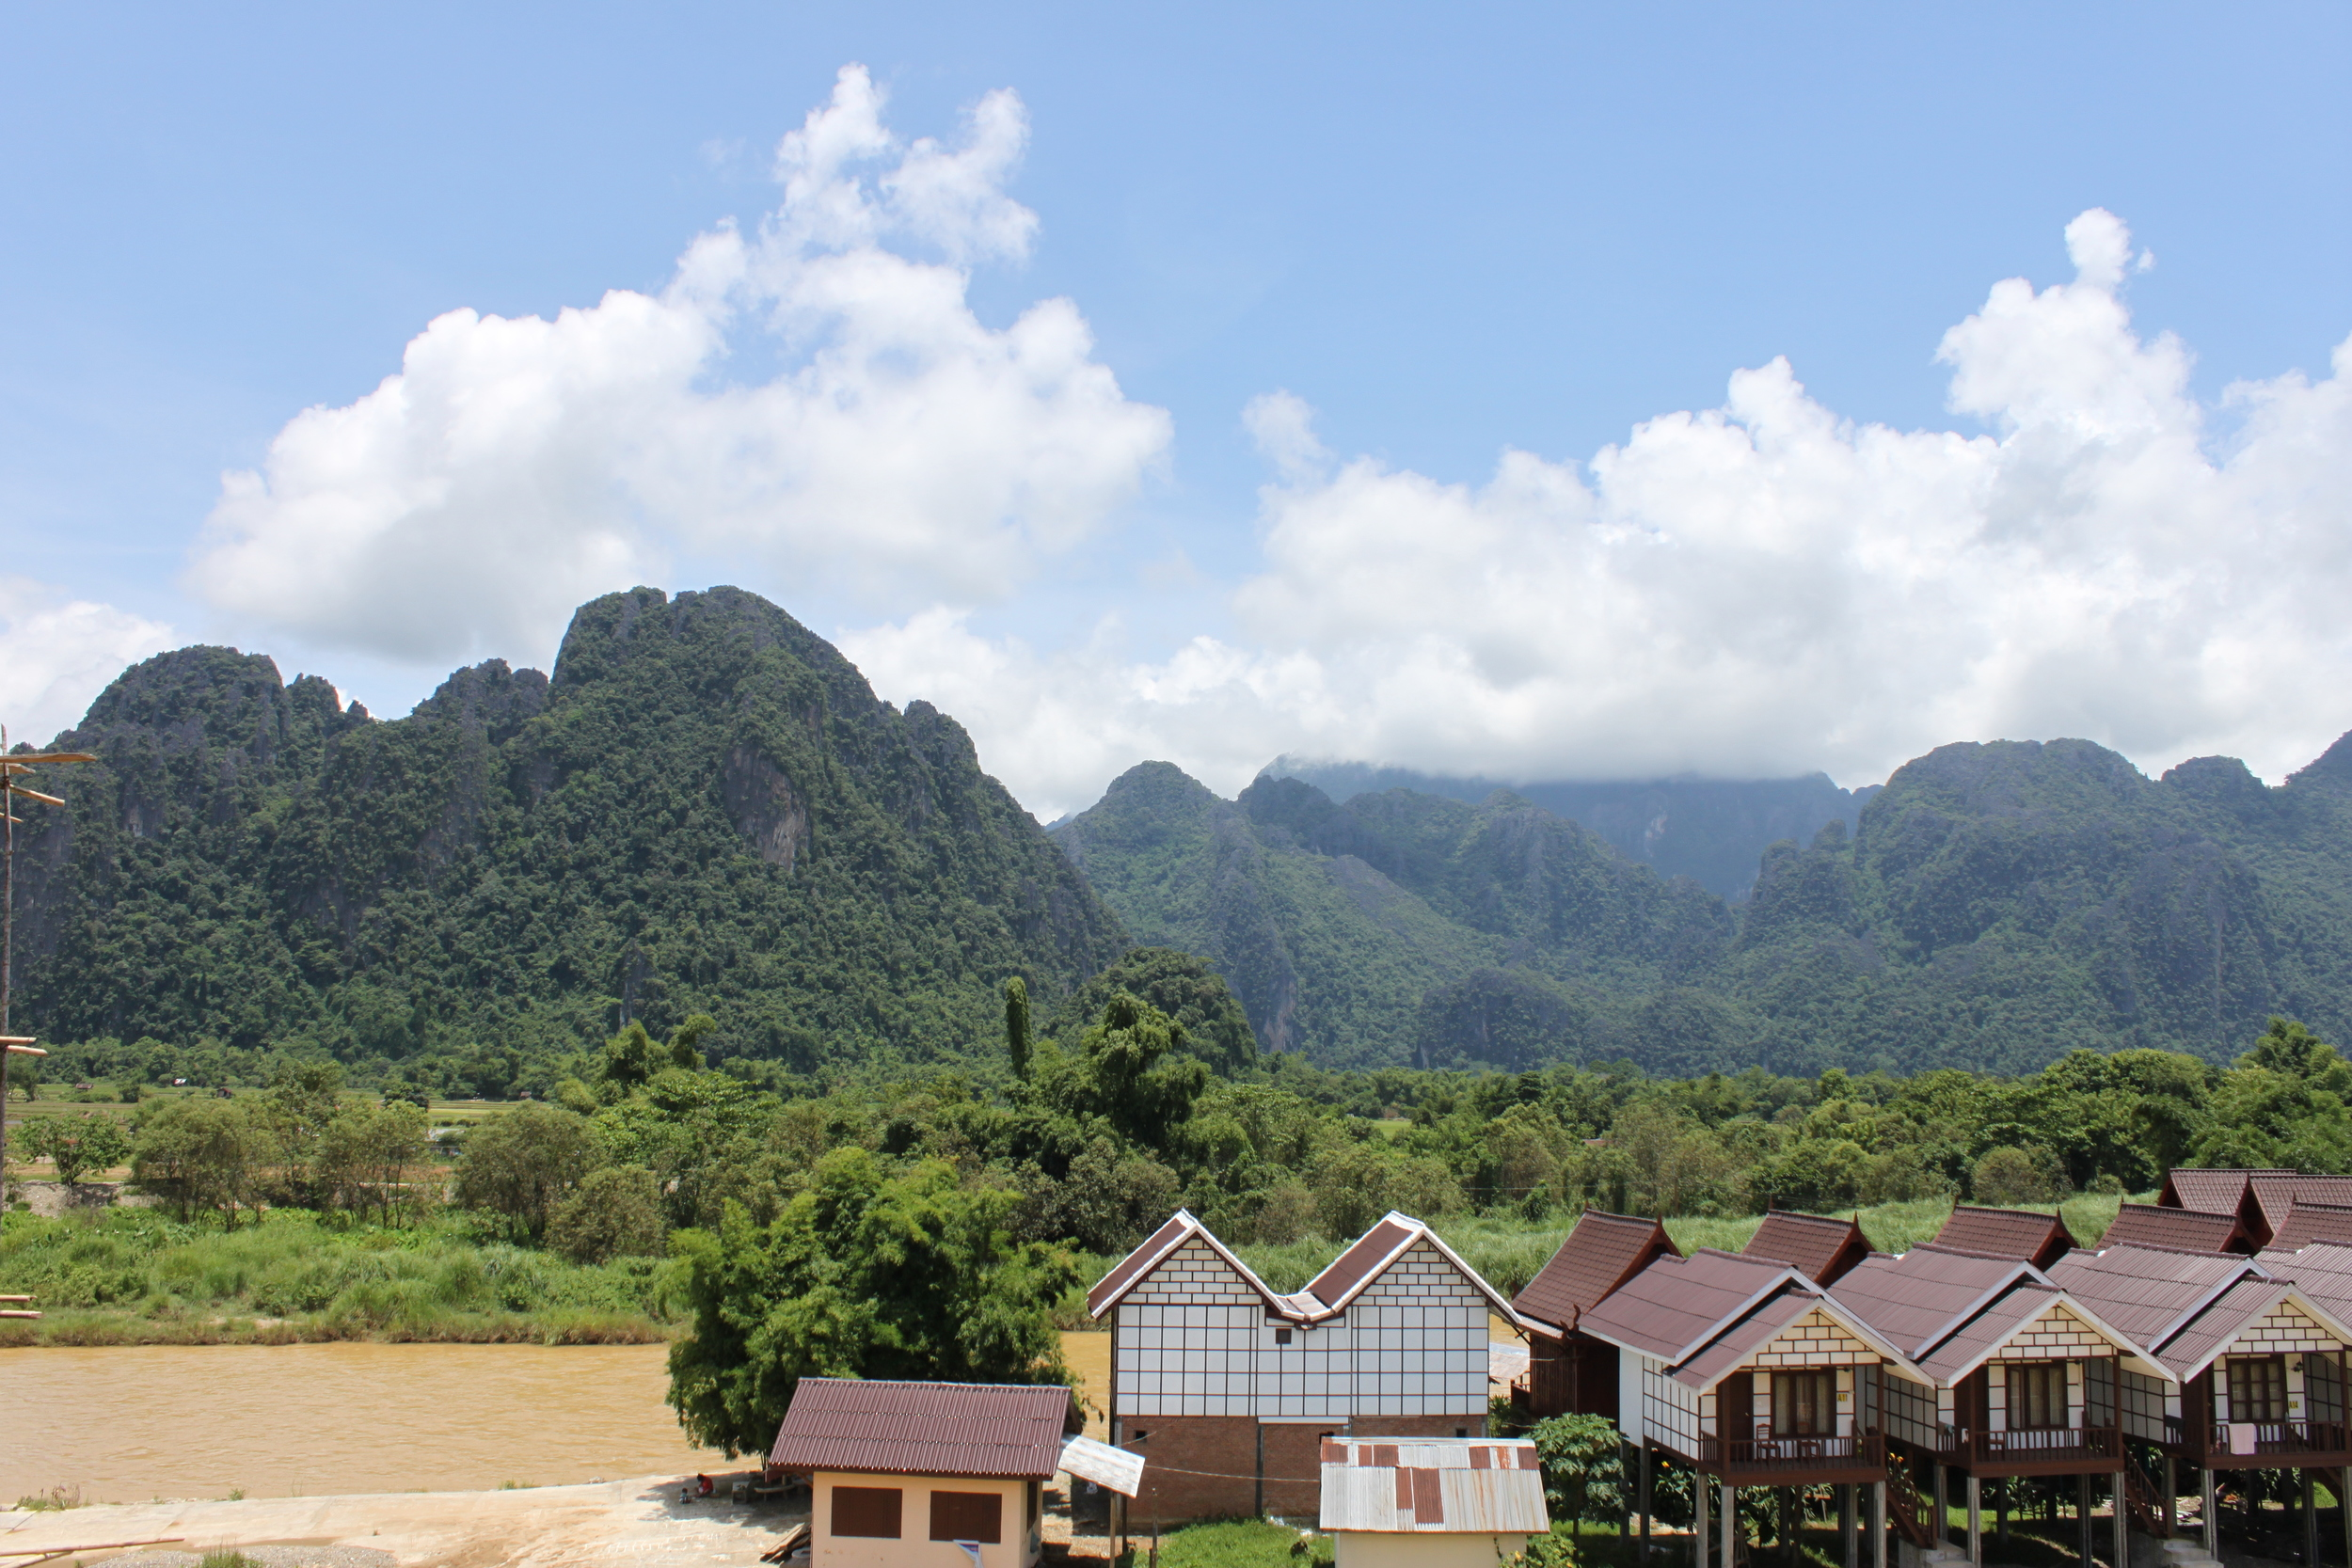 Vang Vieng, Laos 2010